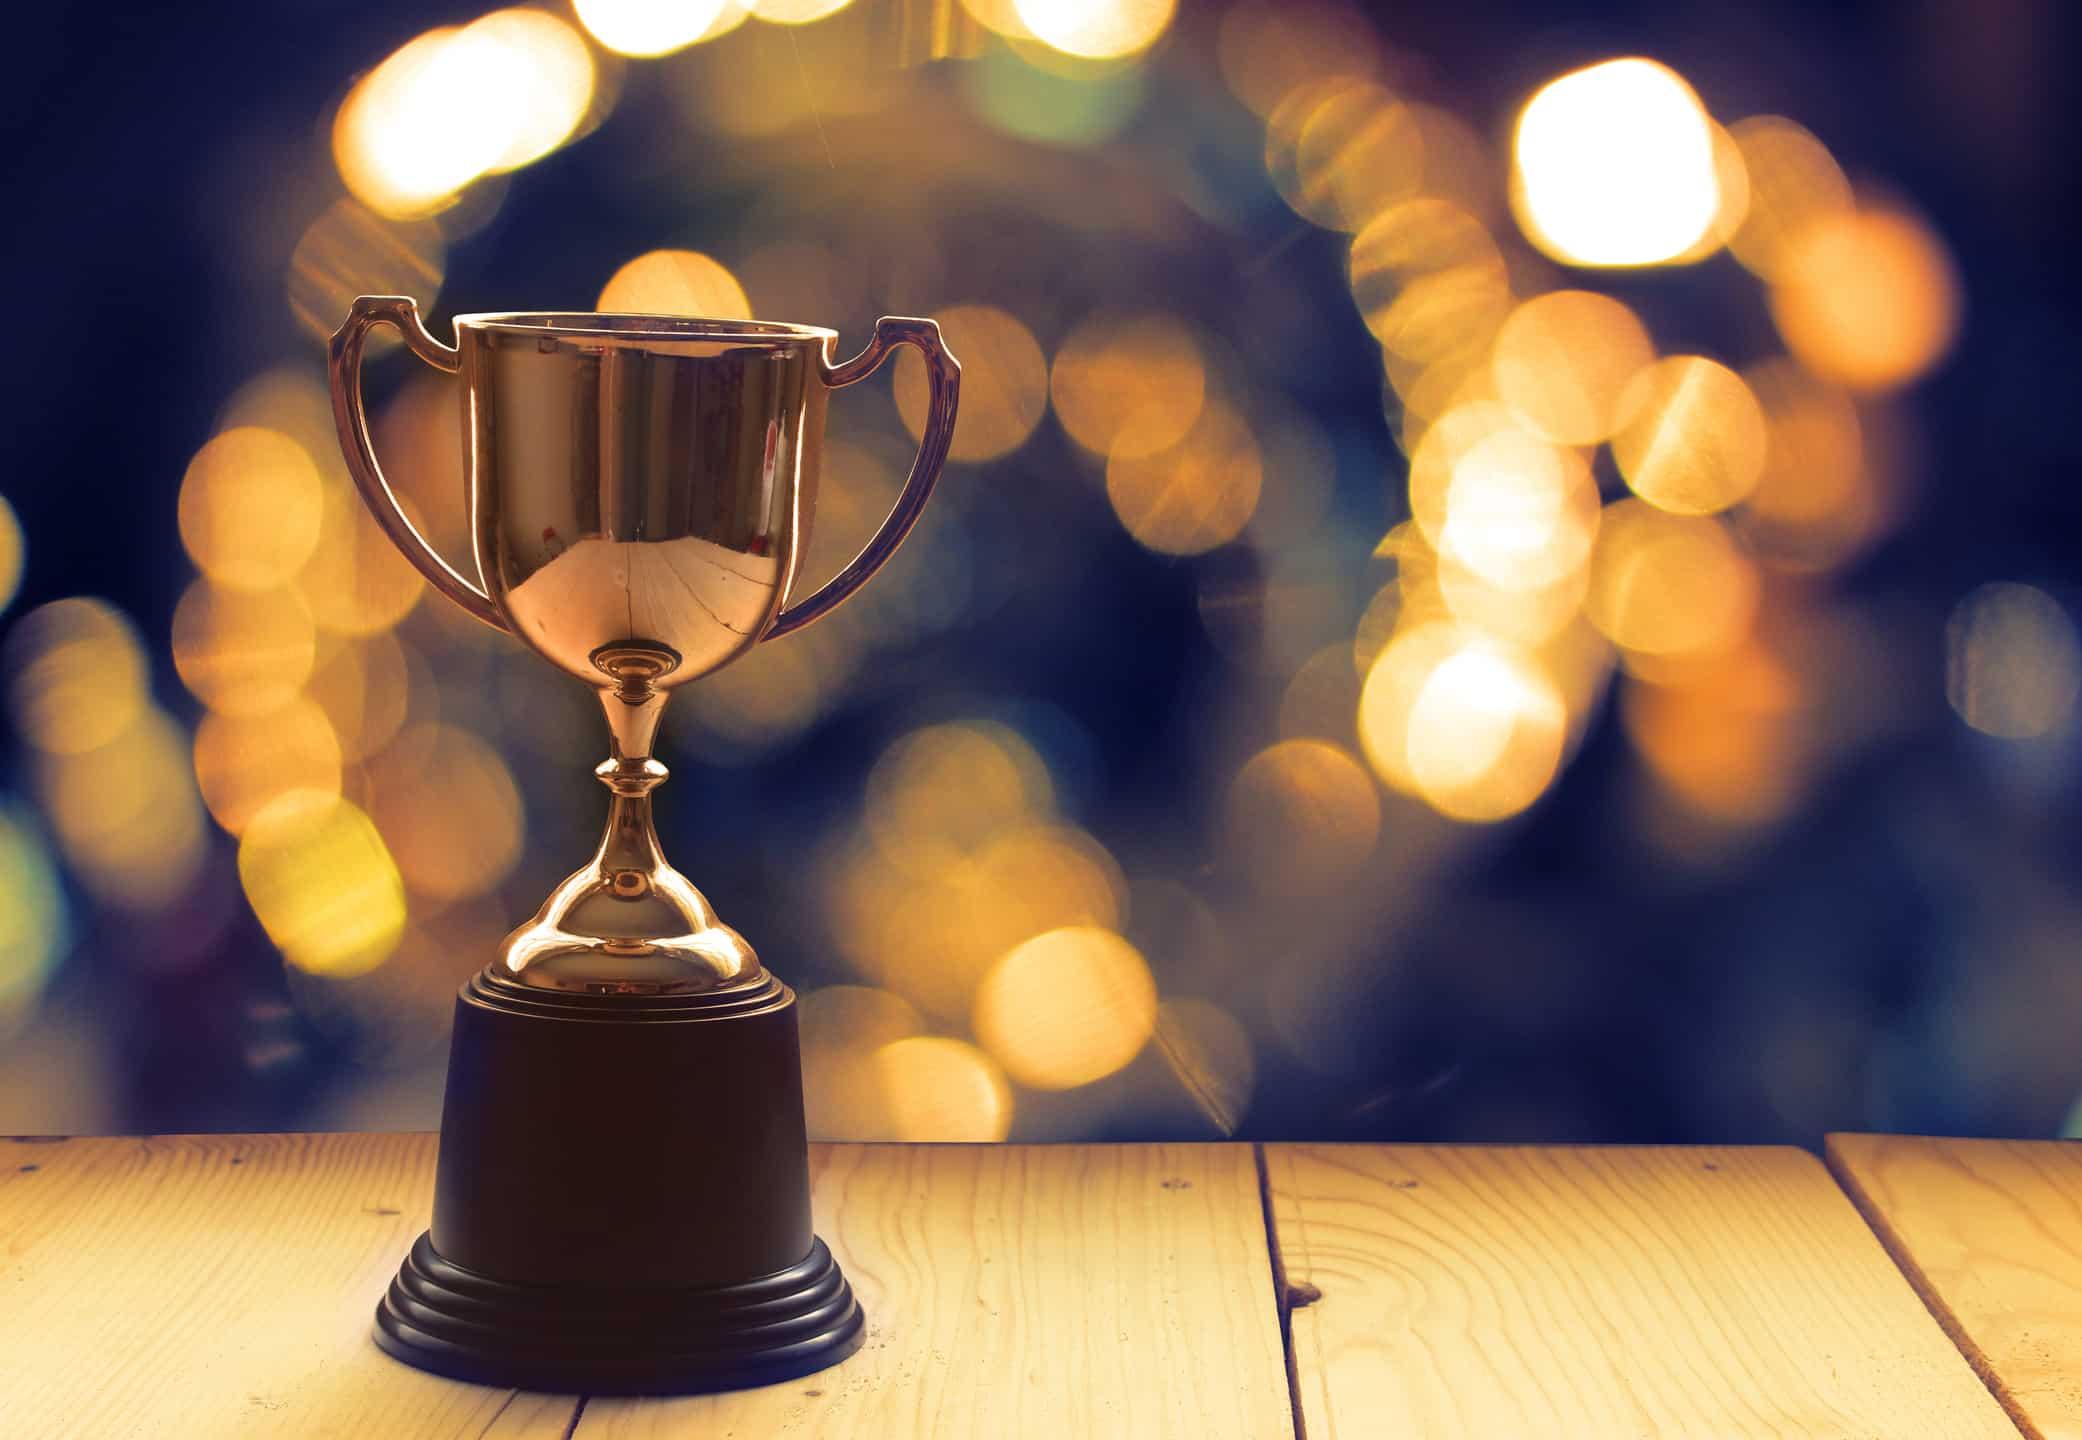 BerniePortal Wins 2019 Bronze Stevie Award for Sales & Customer Service